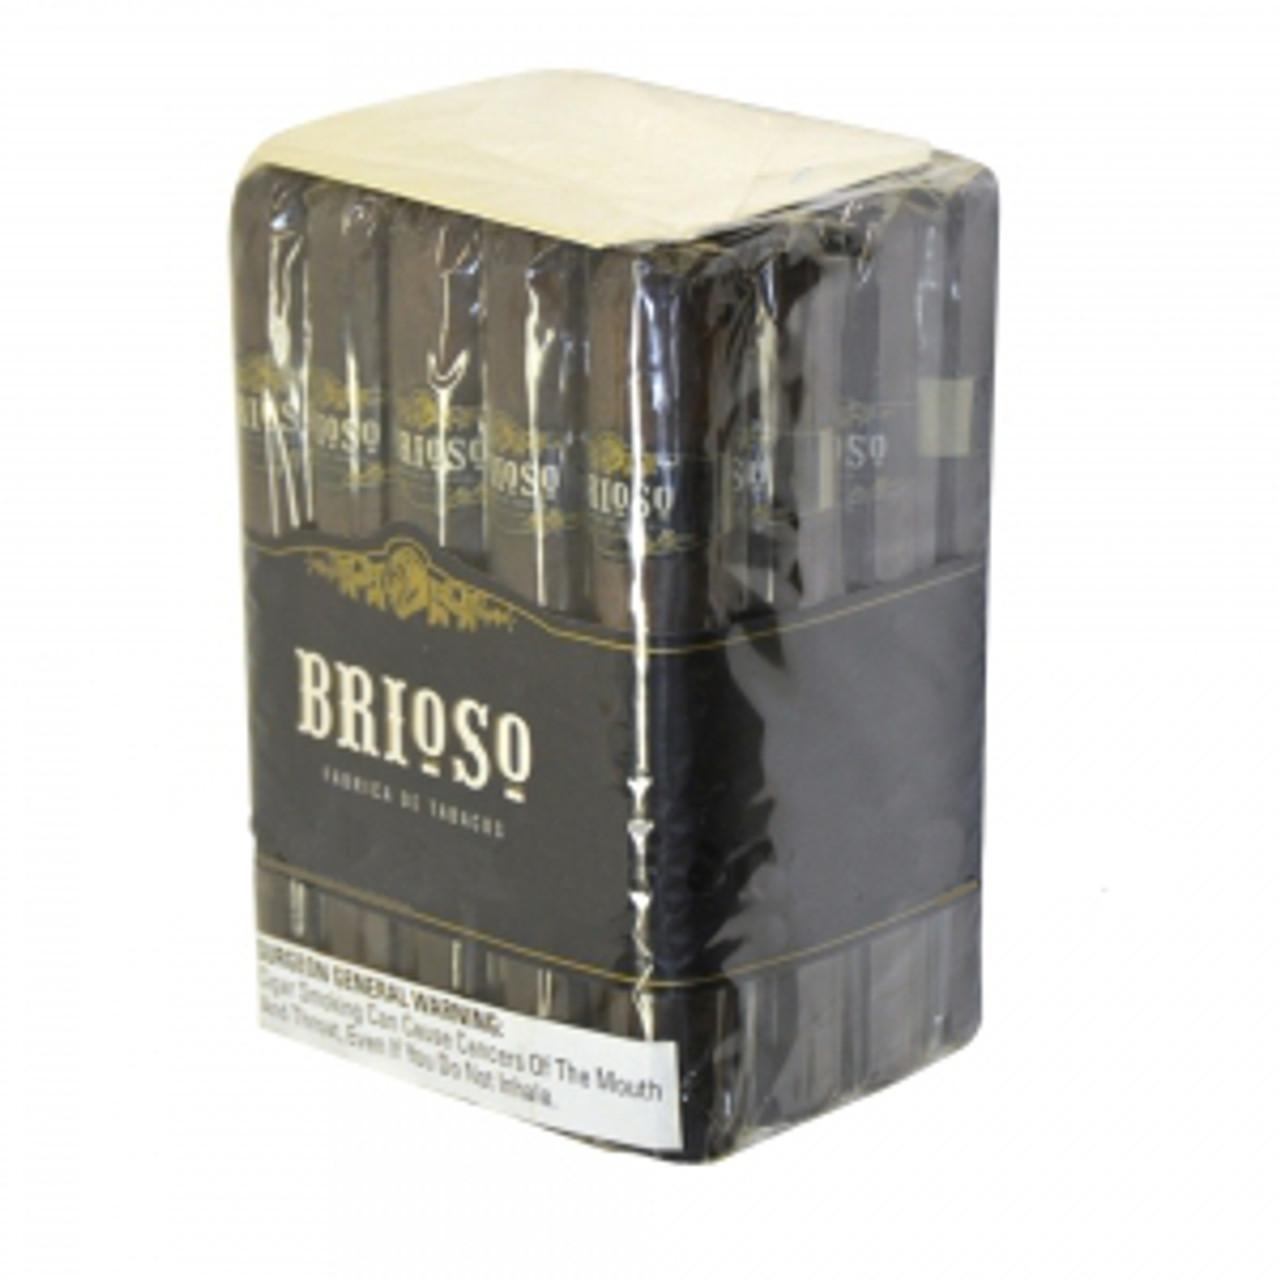 Brioso Toro Maduro Cigars - 6 x 52 (Bundle of 20)